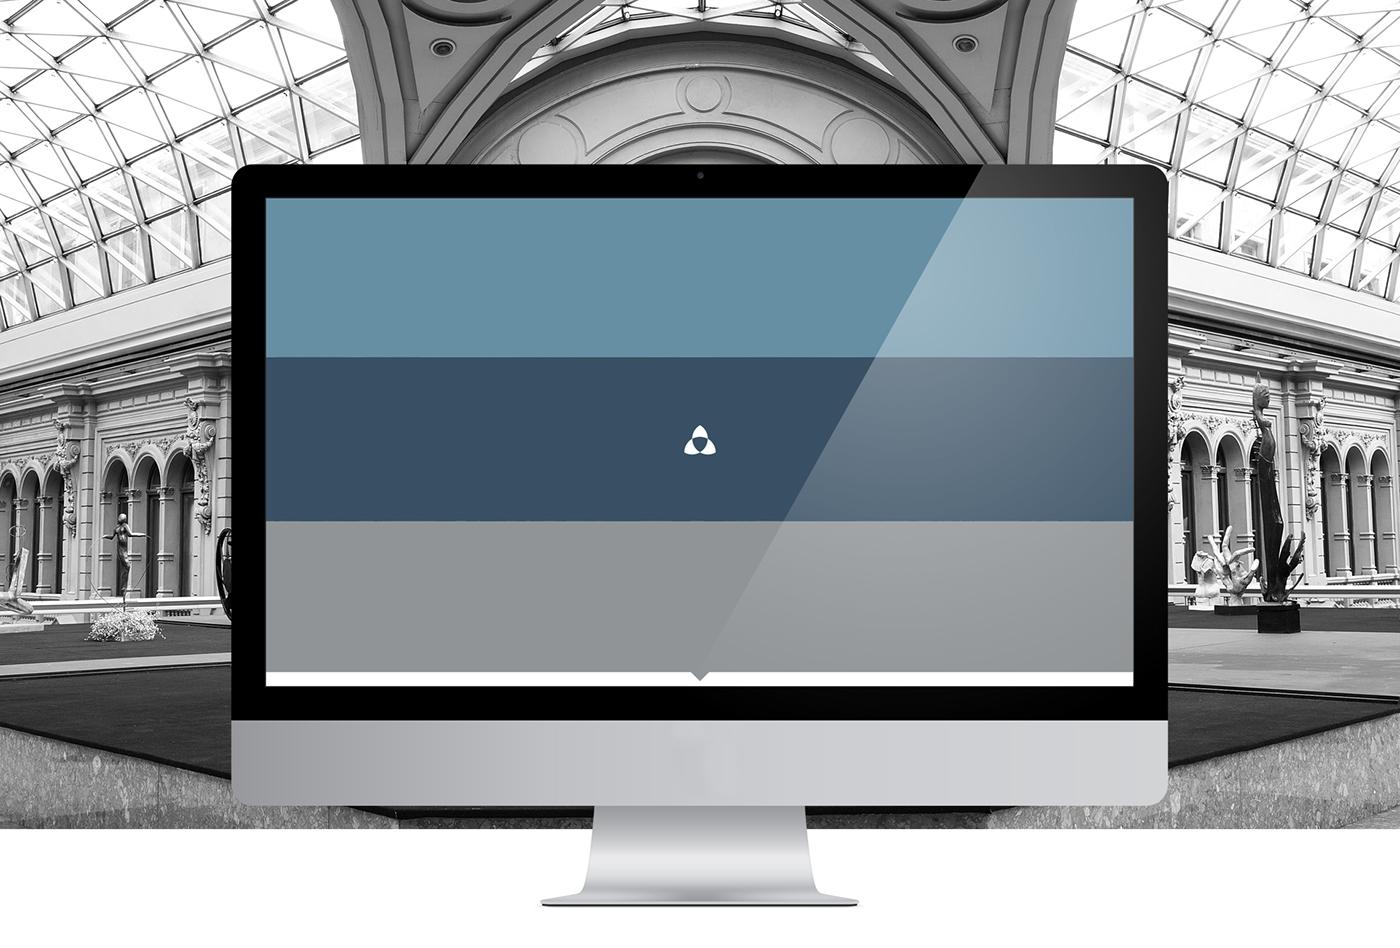 asafyble brand graphicdesign design piacentino Logotype identity Webdesign Web science pharmacy biochemistry legal institutional academic